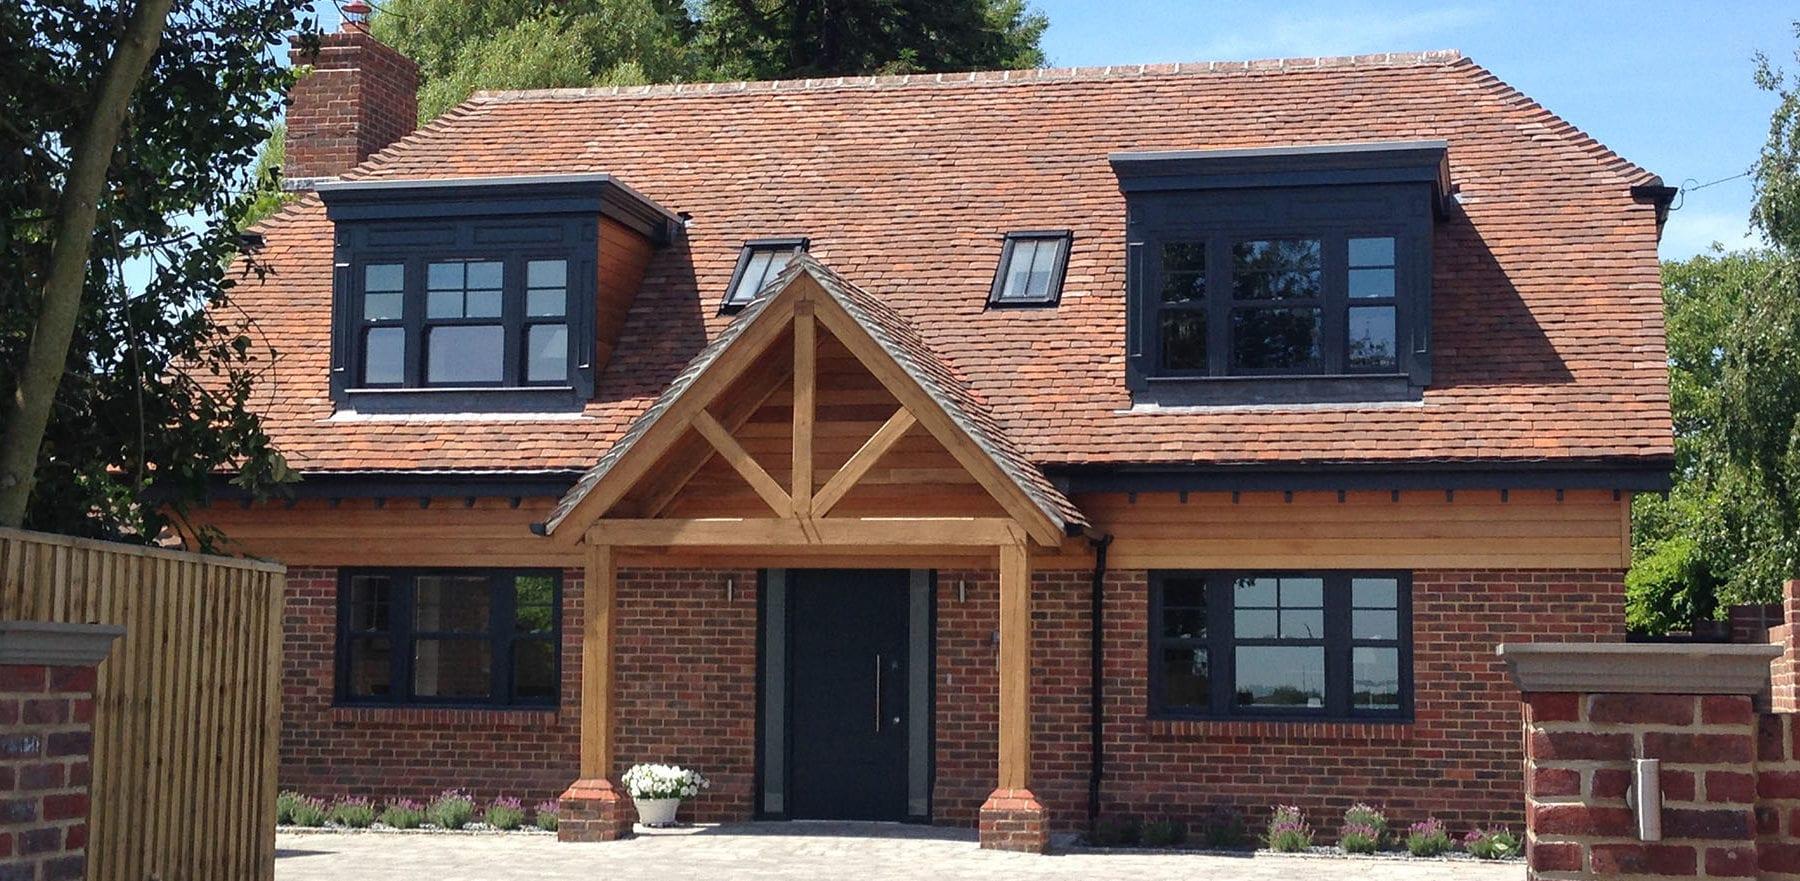 Lifestiles - Handmade Brown Clay Roof Tiles - Bosham, England 2